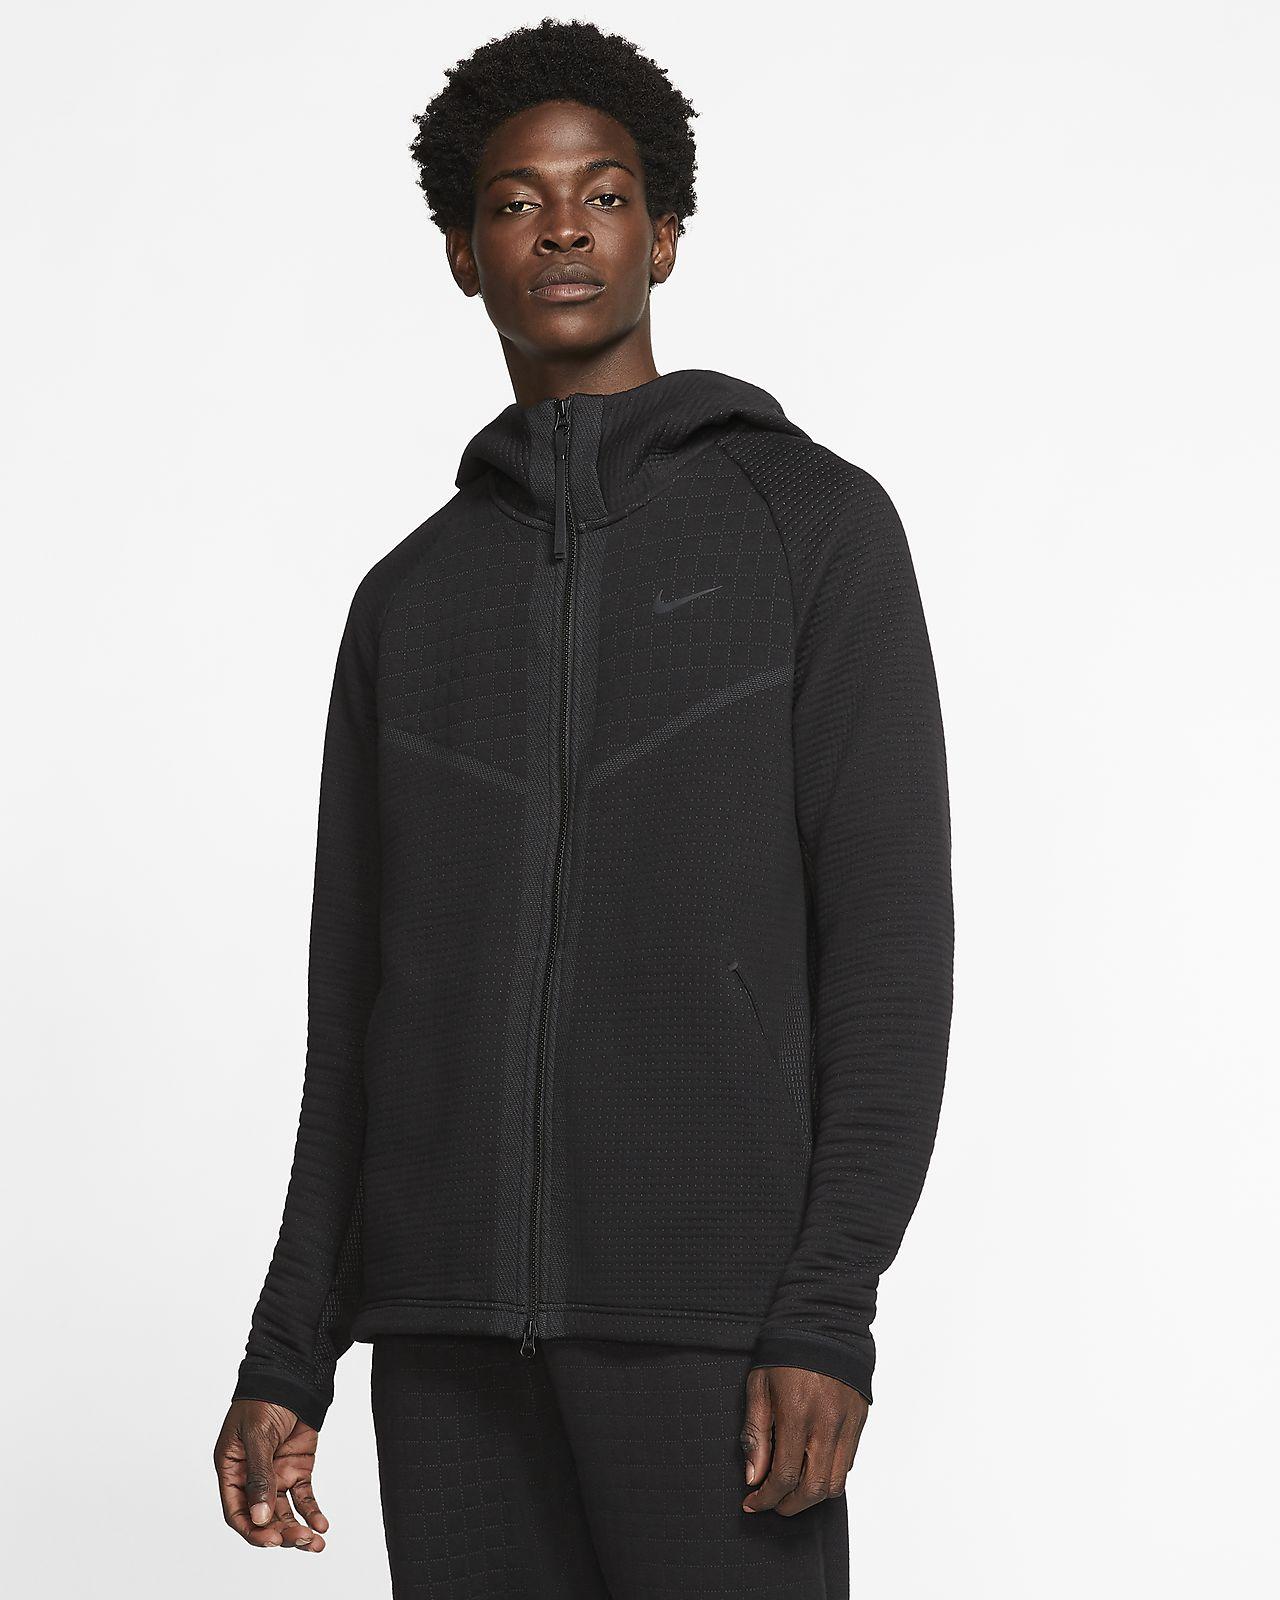 Sweat à capuche et zip Nike Sportswear Tech Fleece Engineered pour Homme